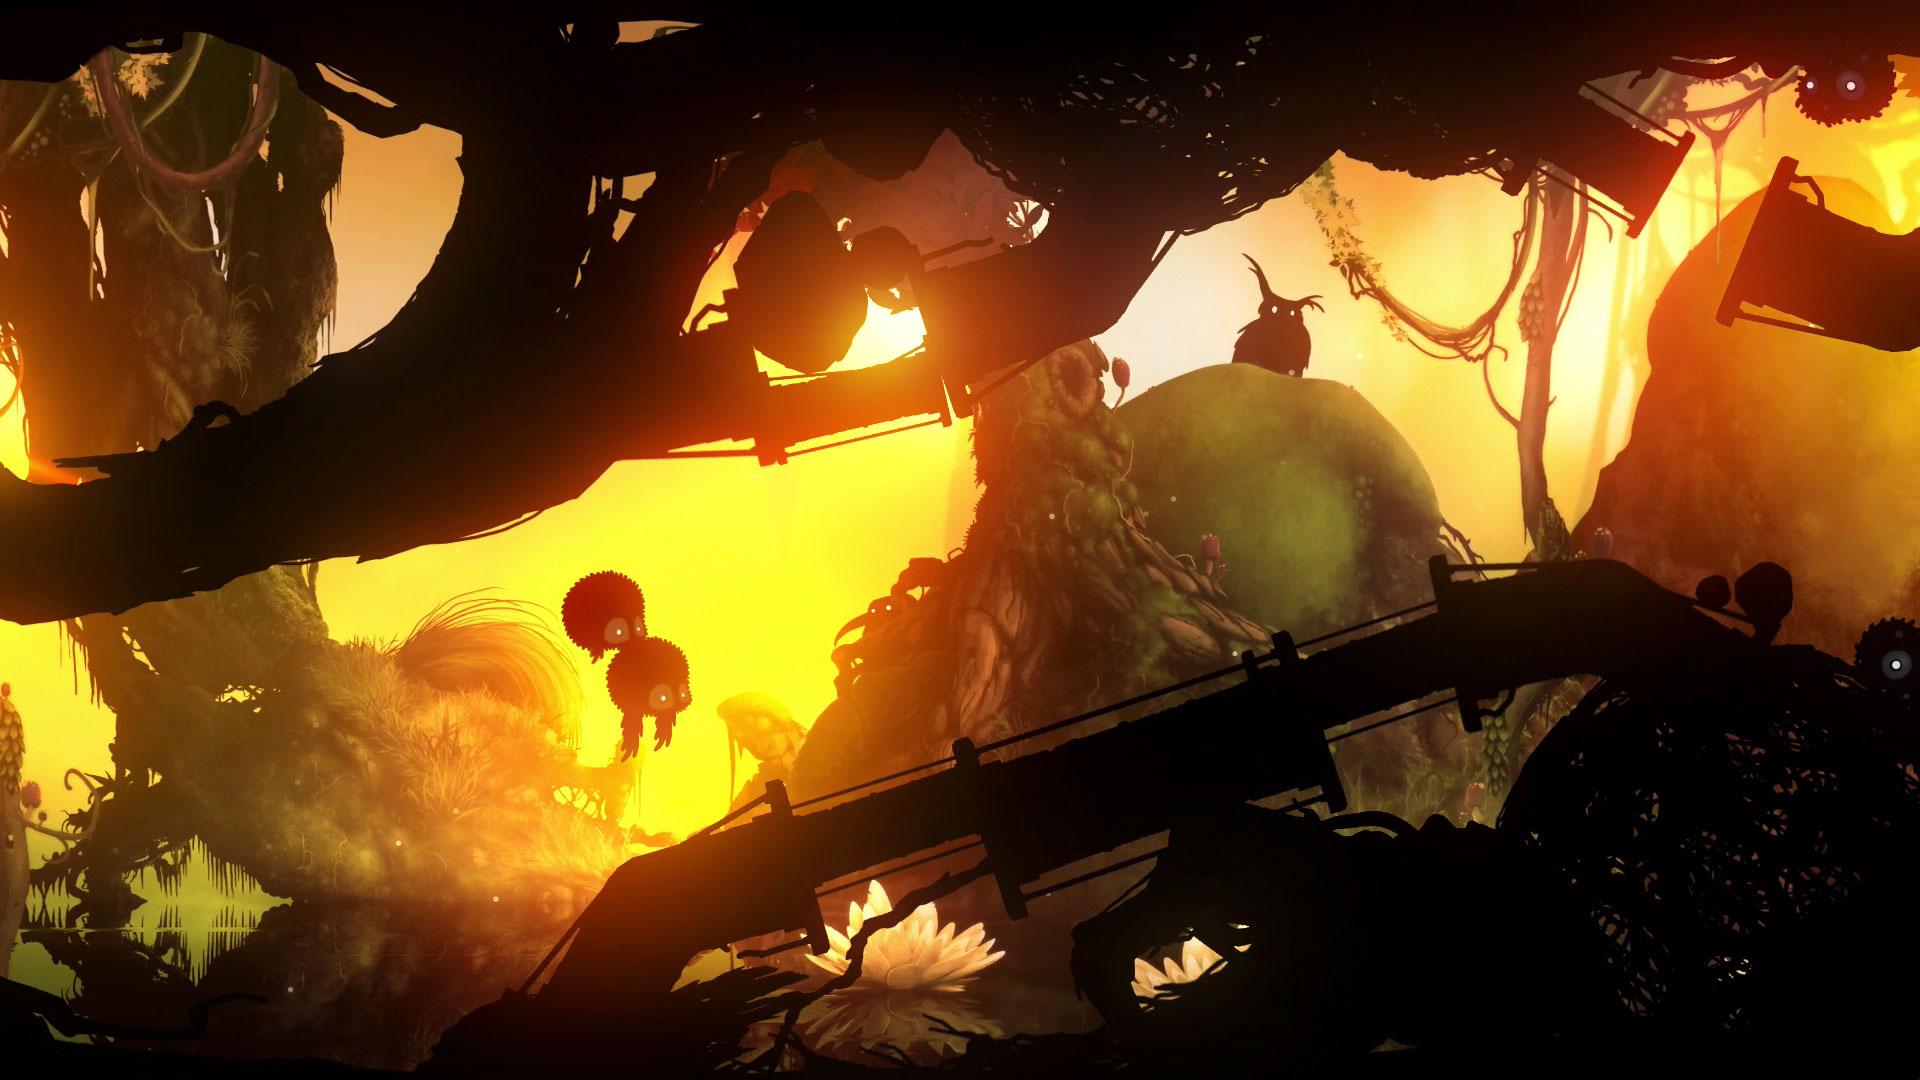 『Badland: Game of the Year Edition』ゲーム画面